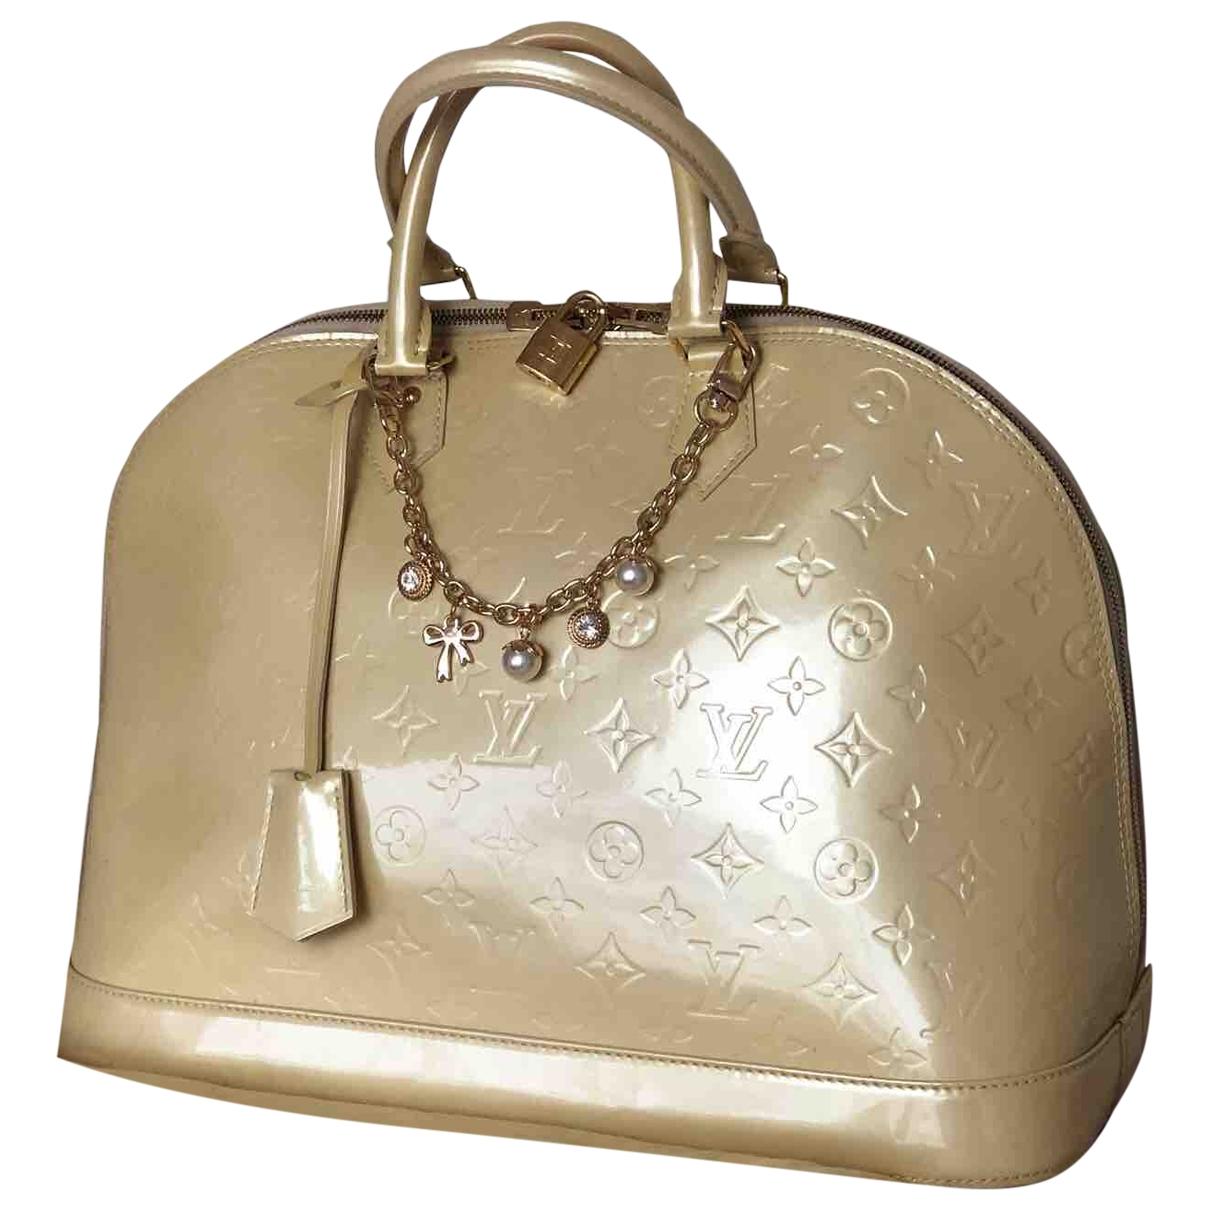 Louis Vuitton - Sac a main Alma pour femme en cuir verni - beige